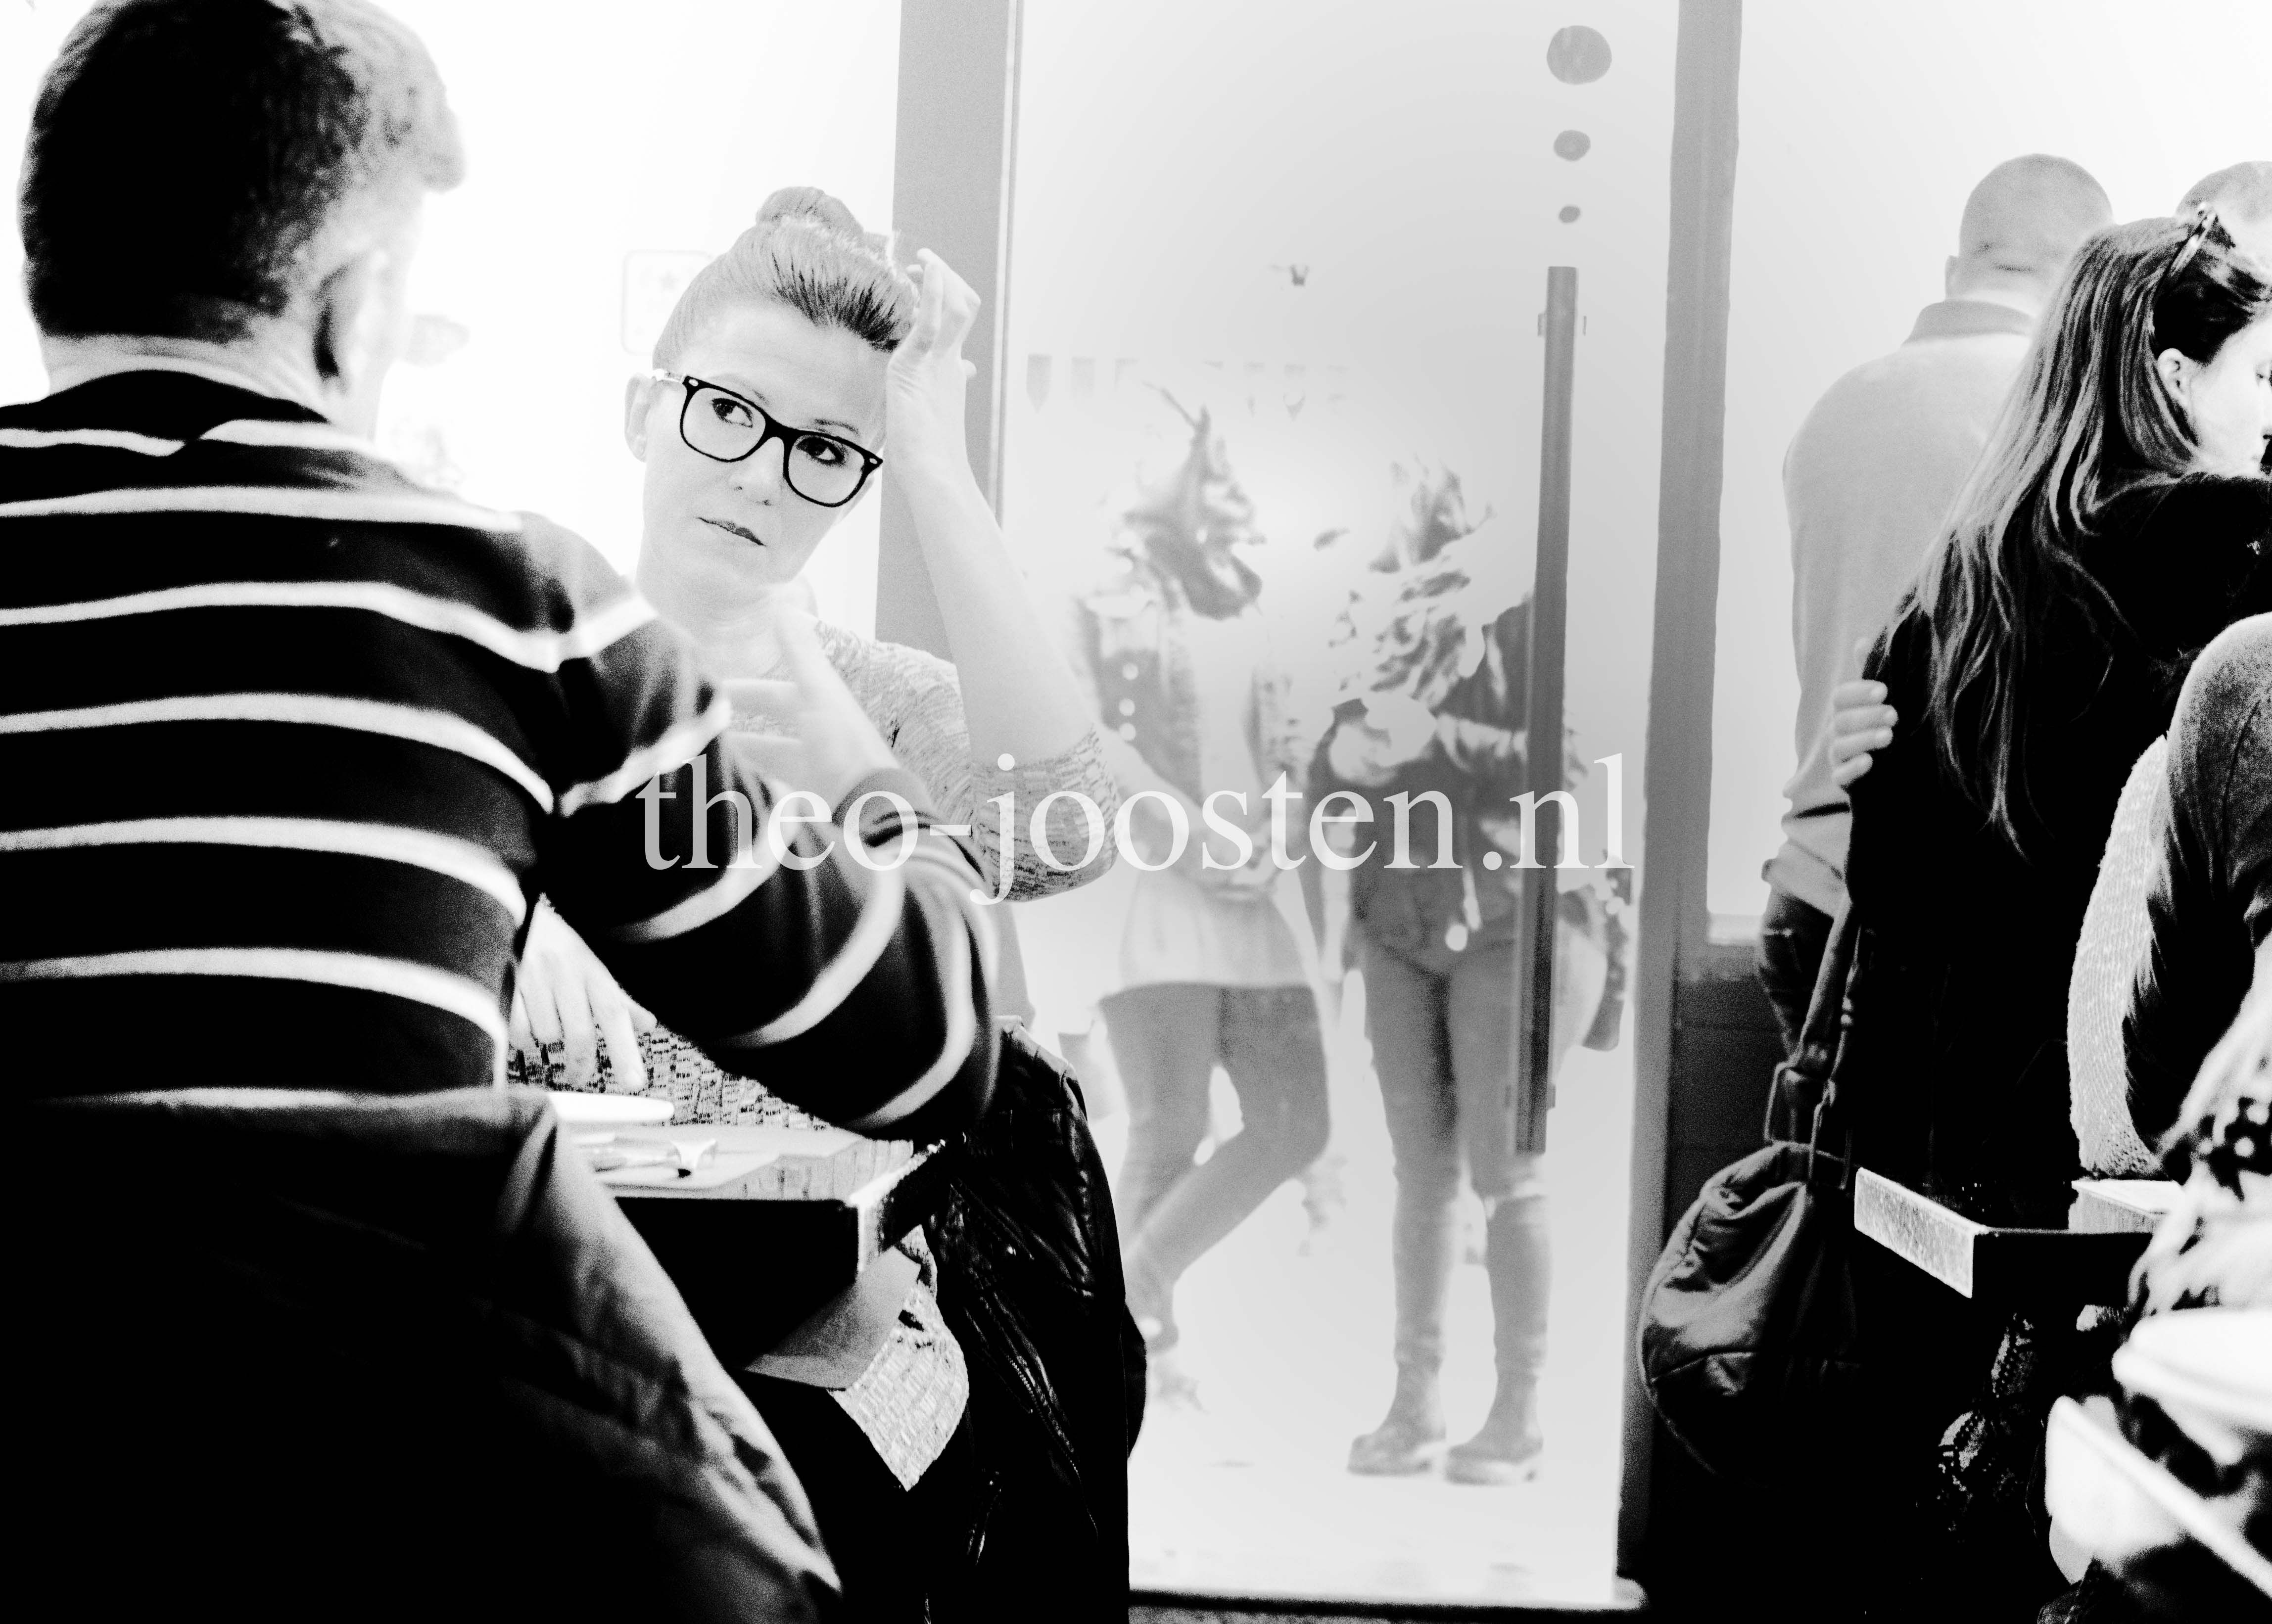 Barcelona restaurant La Bombeta                 fotografie black and white                             street photography women